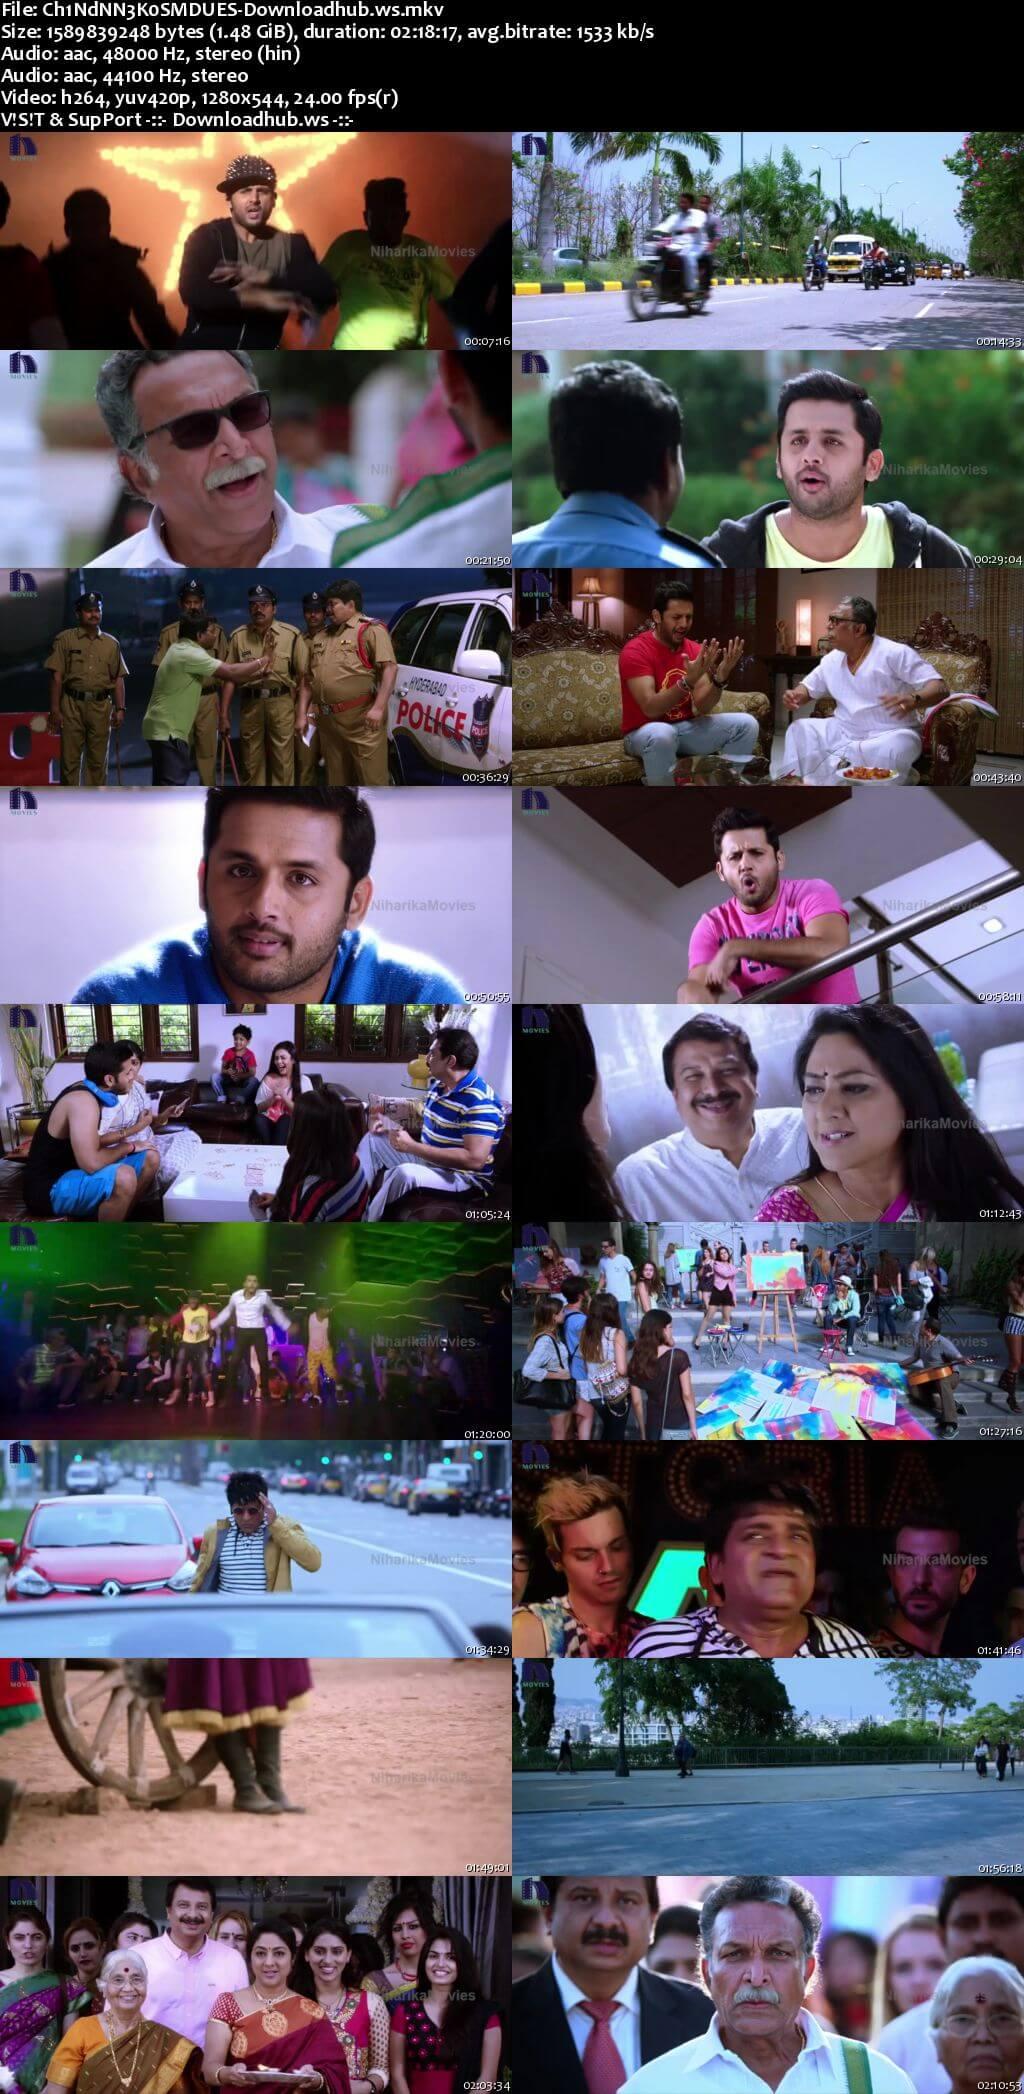 Chinnadana Nee Kosam 2014 UNCUT Hindi Dual Audio 720p HDRip Free Download